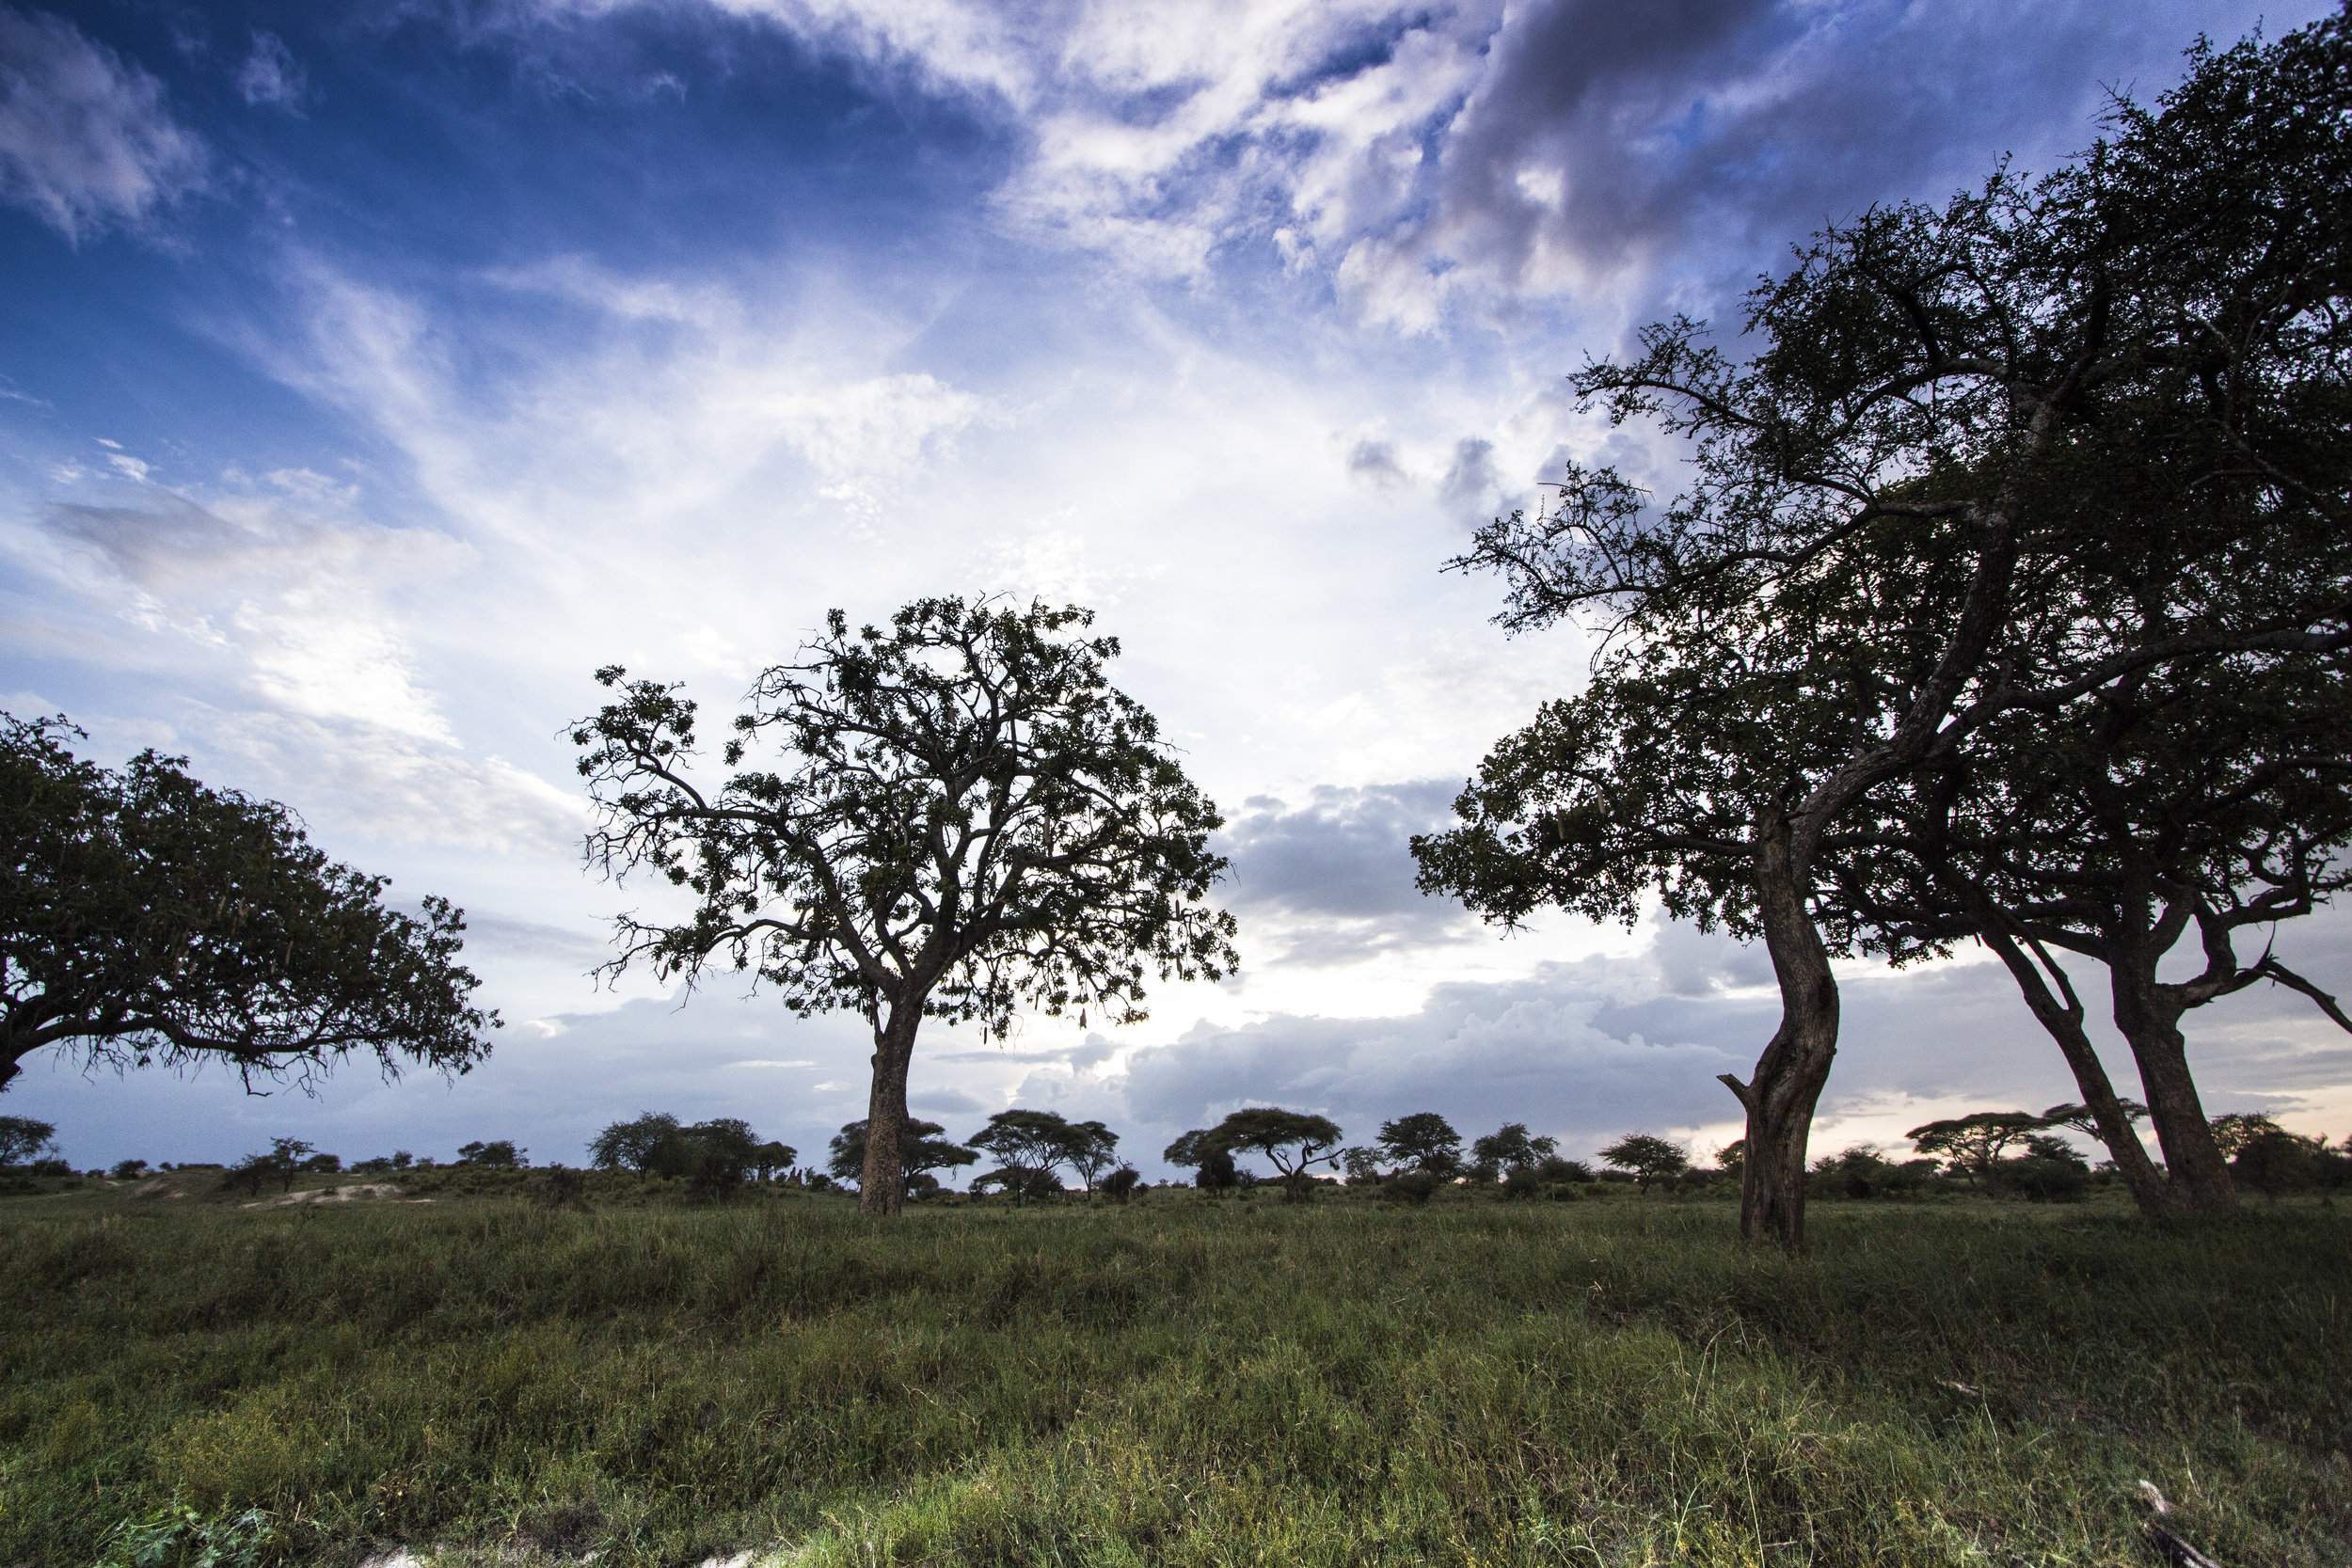 Tarangire-National-Park-landscape-Tracey-Van-Wijk-HR.jpg